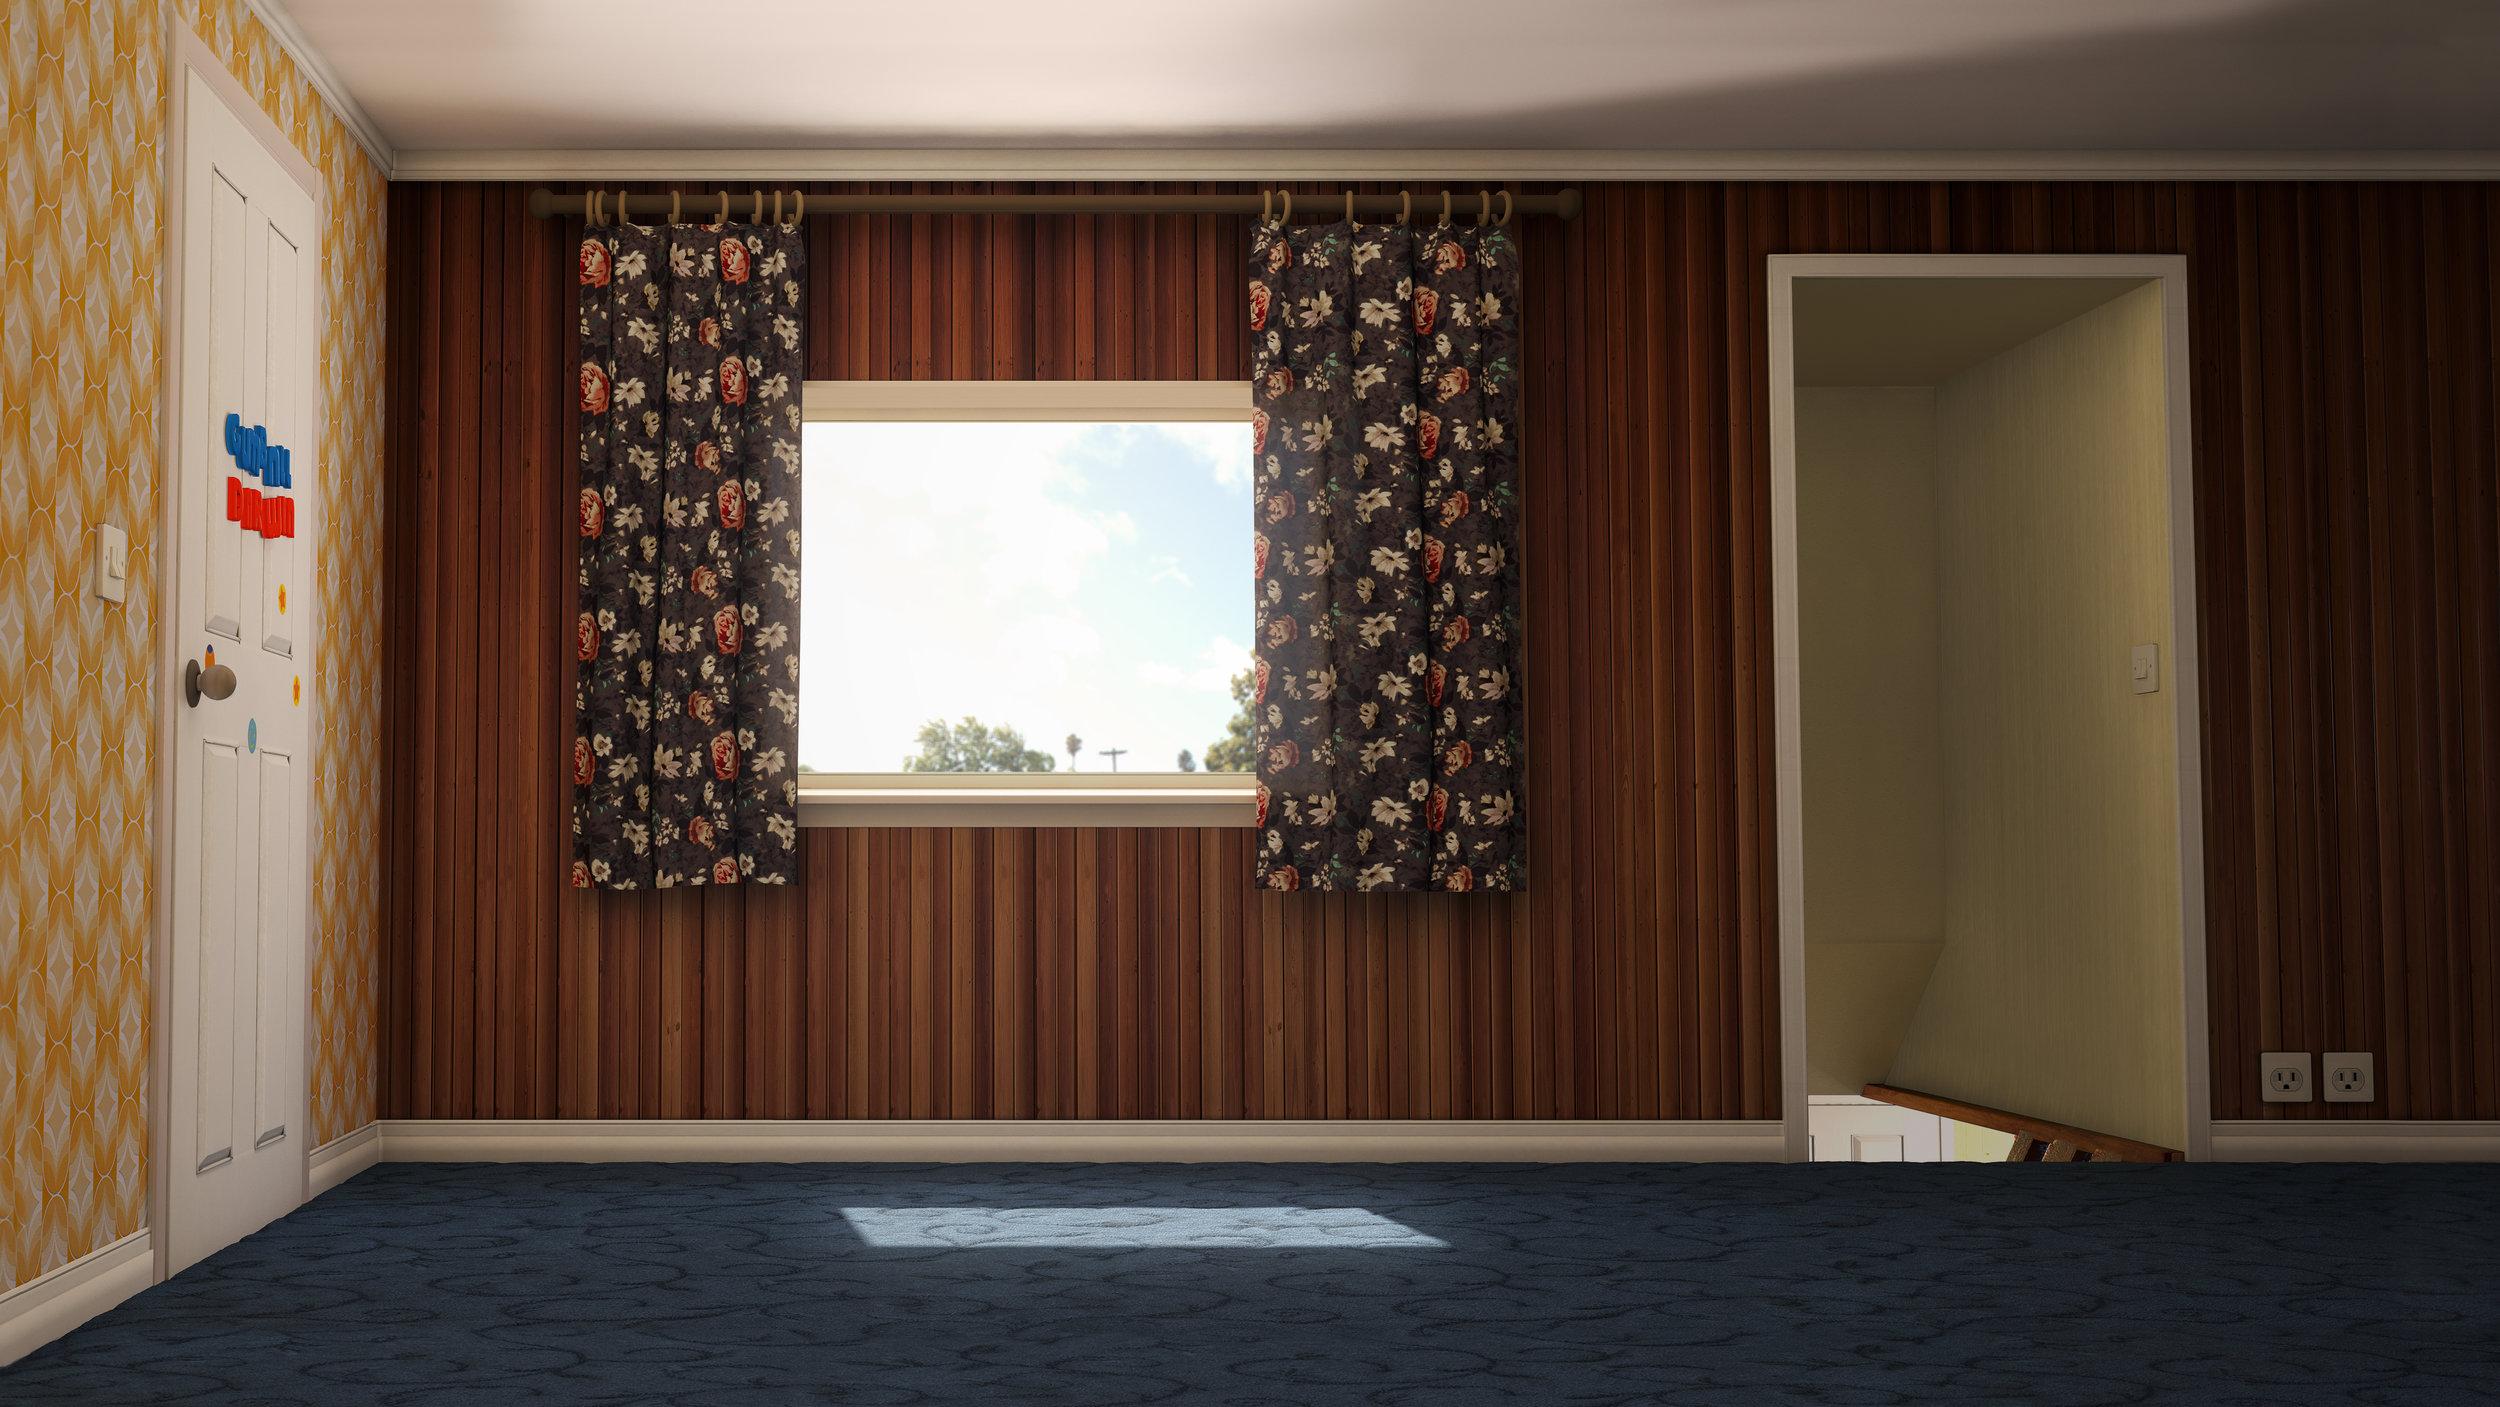 GB324FRIEND_Sc162_BGmatte_WattersonsHouse_Corridor_v017.jpg